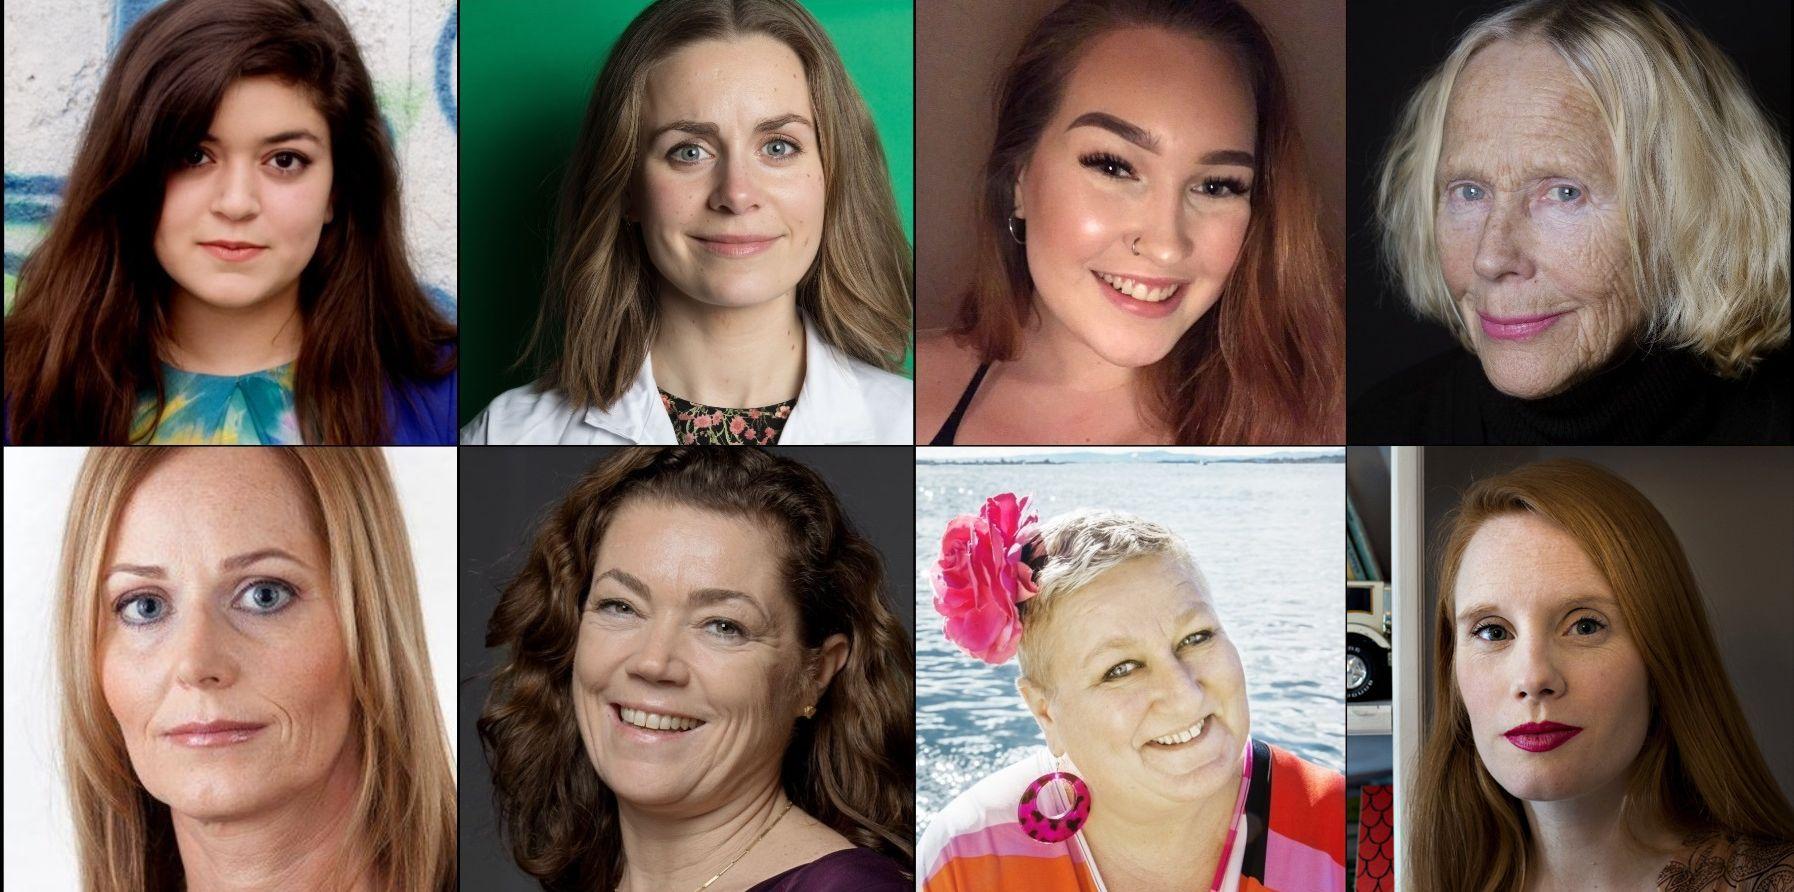 ÅTTE STEMMER: Fra venstre over: Nancy Herz, Nina Brochmann, Cecilie Gryte Fjelldal, Henny Moan. Fra venstre under: Mathilde Fasting, Kristin Skogen Lund, Lene Wikander og Susanne Kaluza.